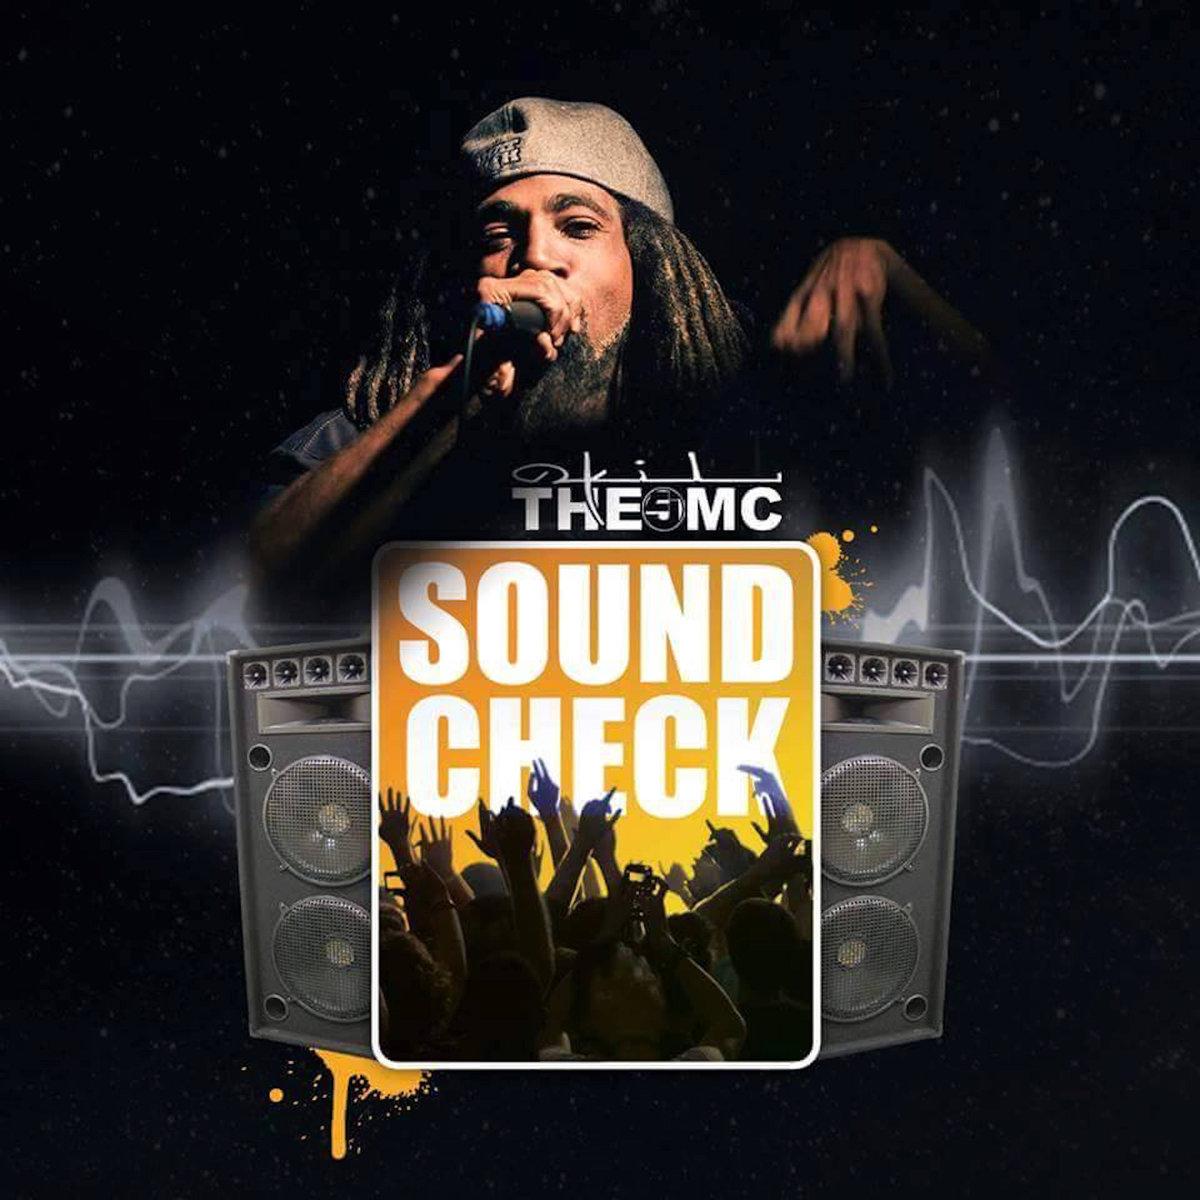 Sound_check